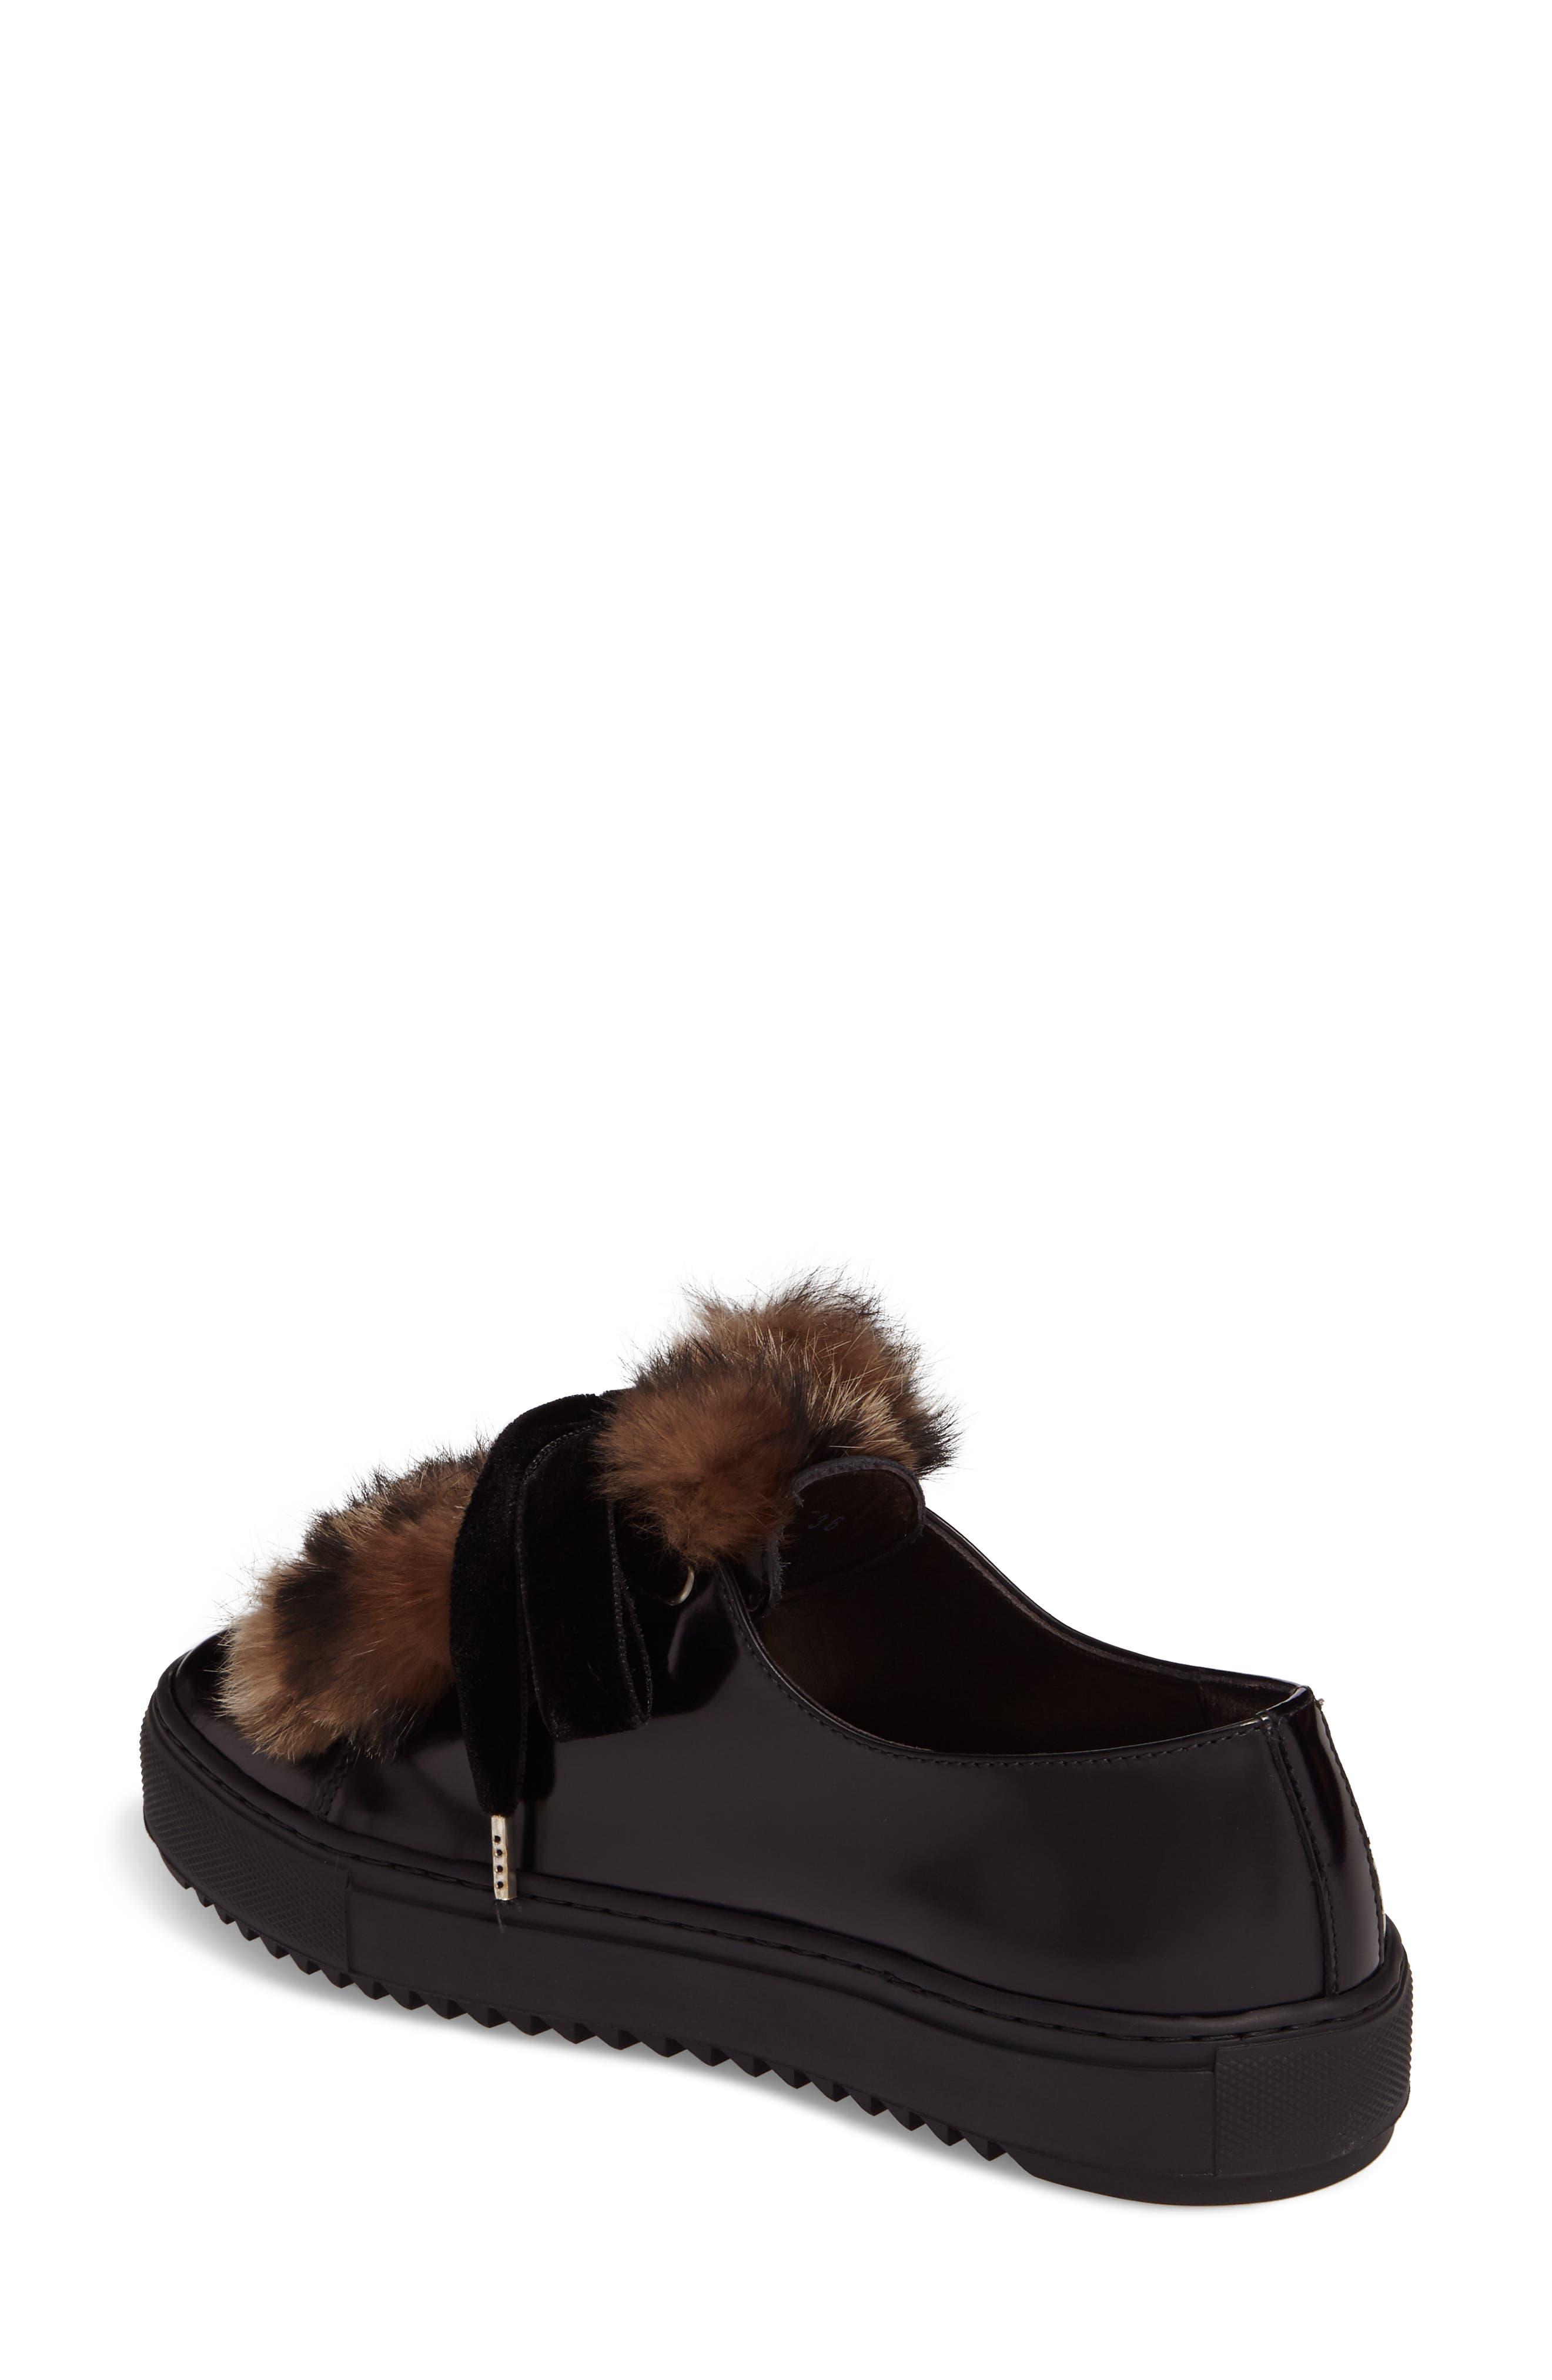 Fluff Genuine Rabbit Fur Sneaker,                             Alternate thumbnail 2, color,                             001